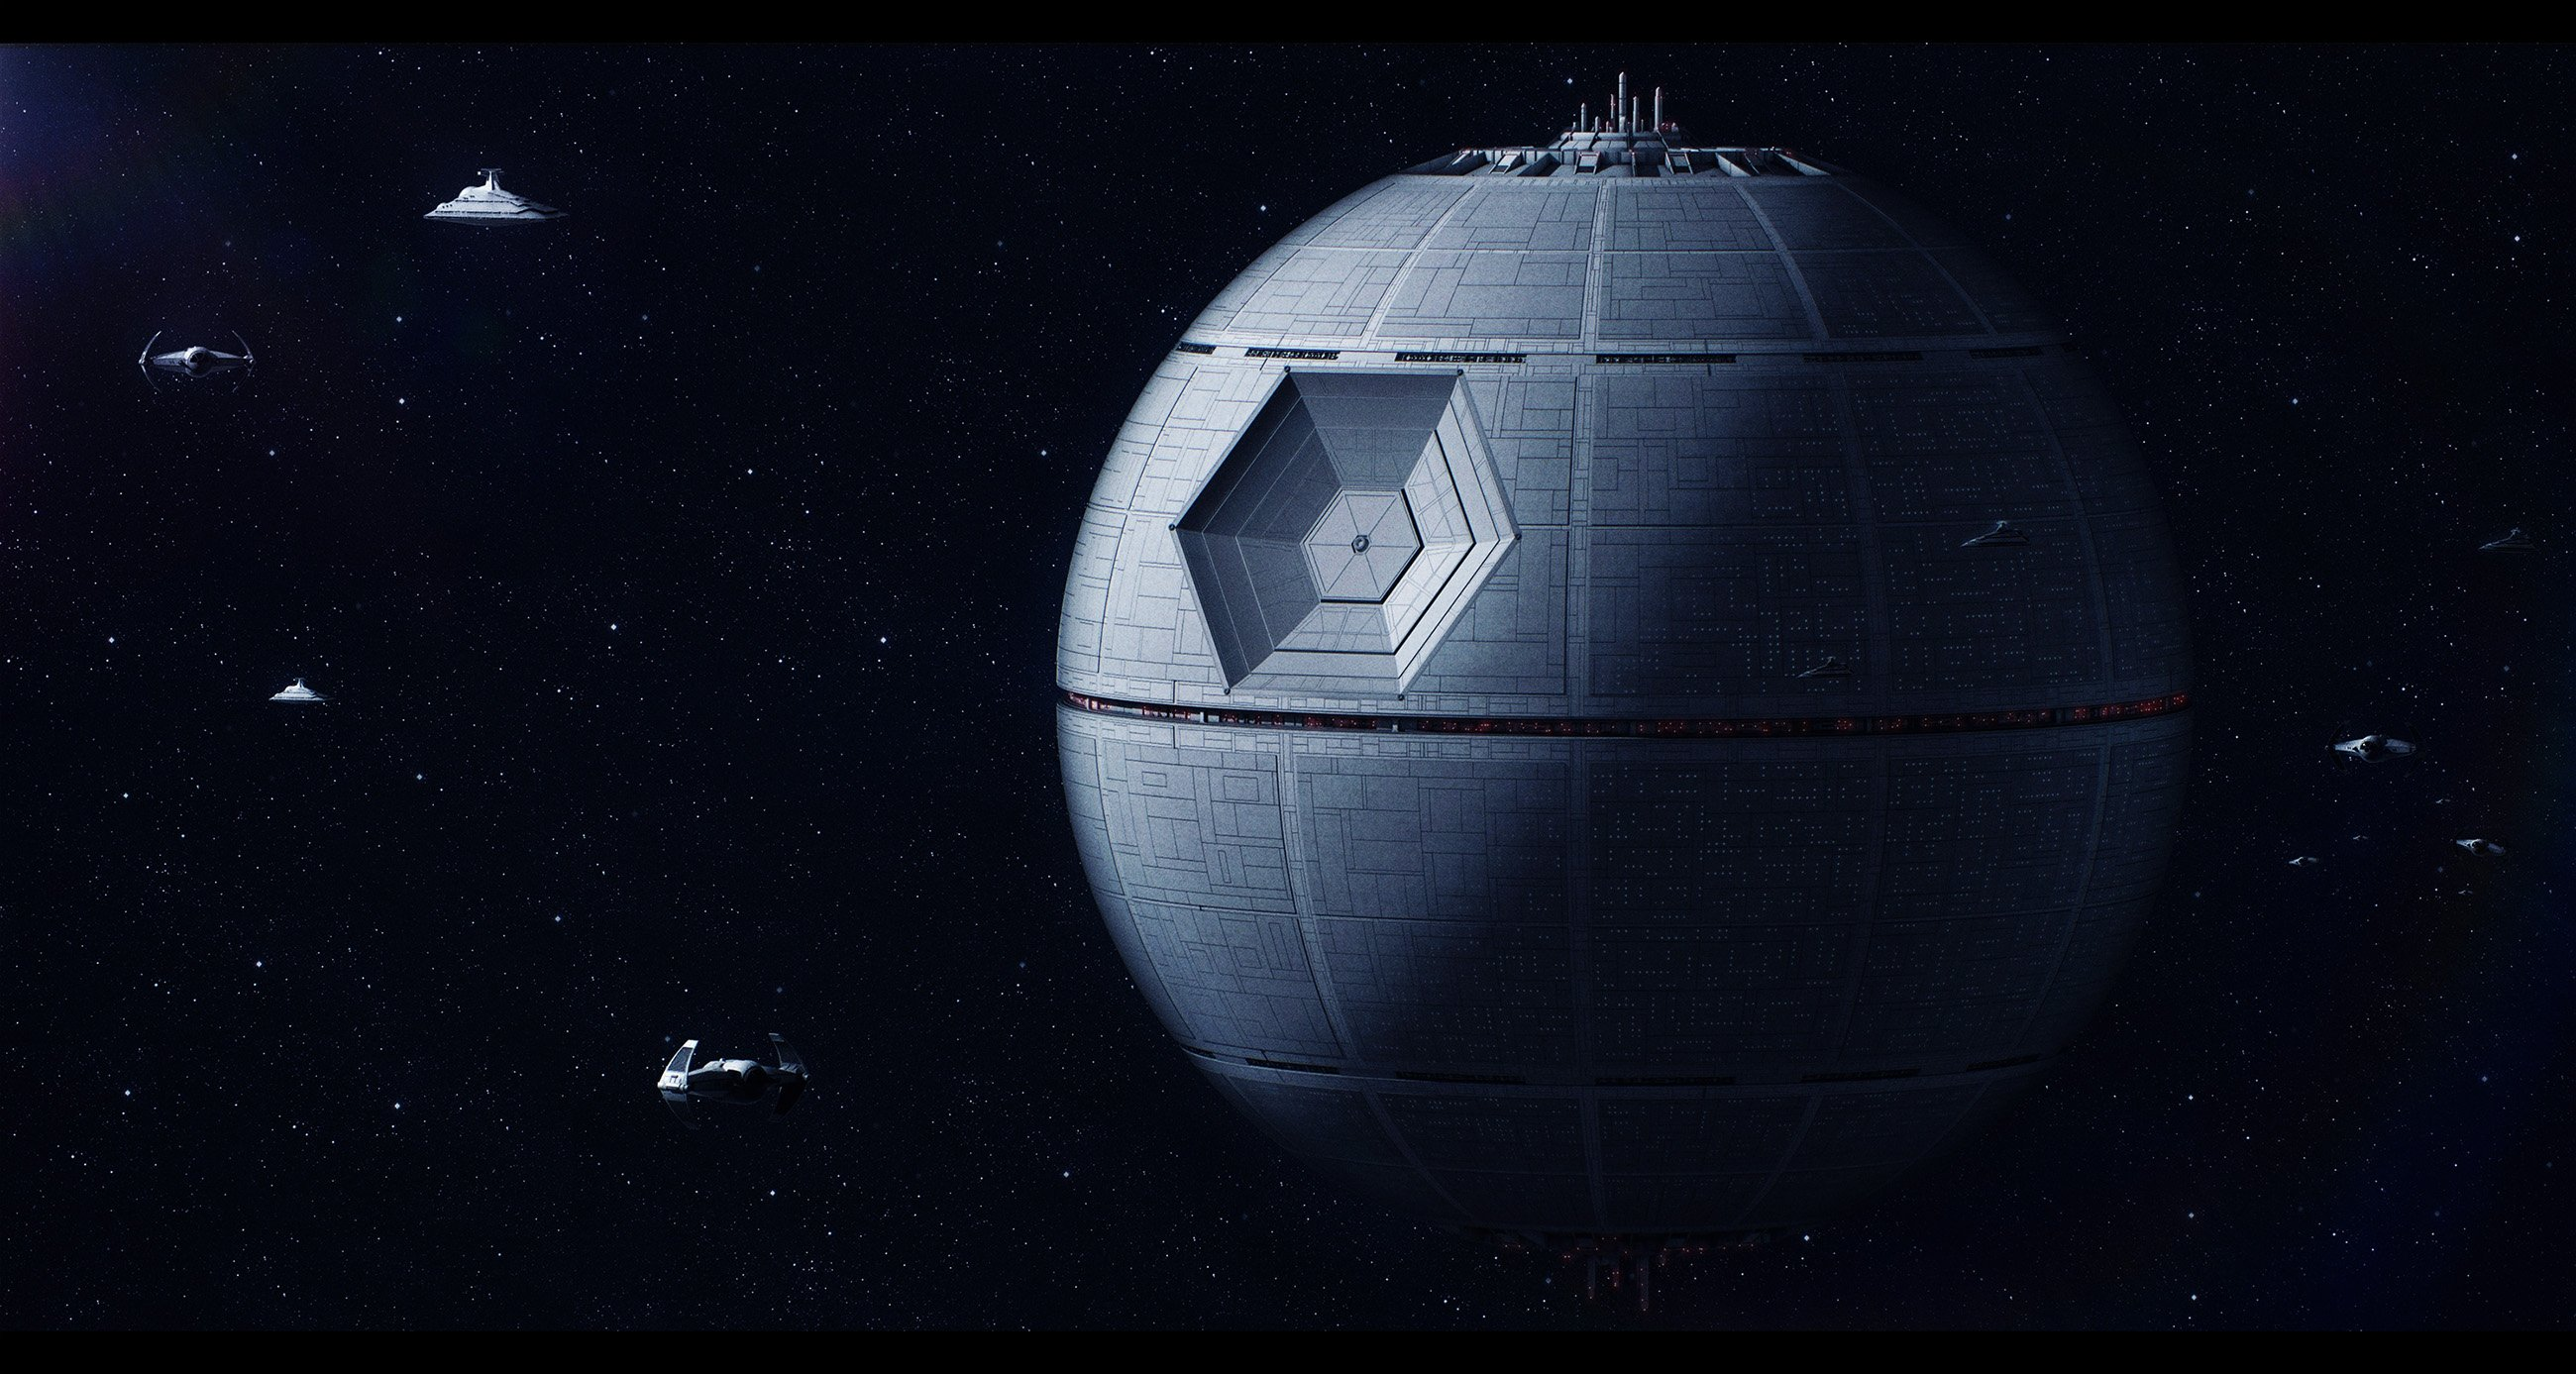 Tarkins Death Star Wallpaper